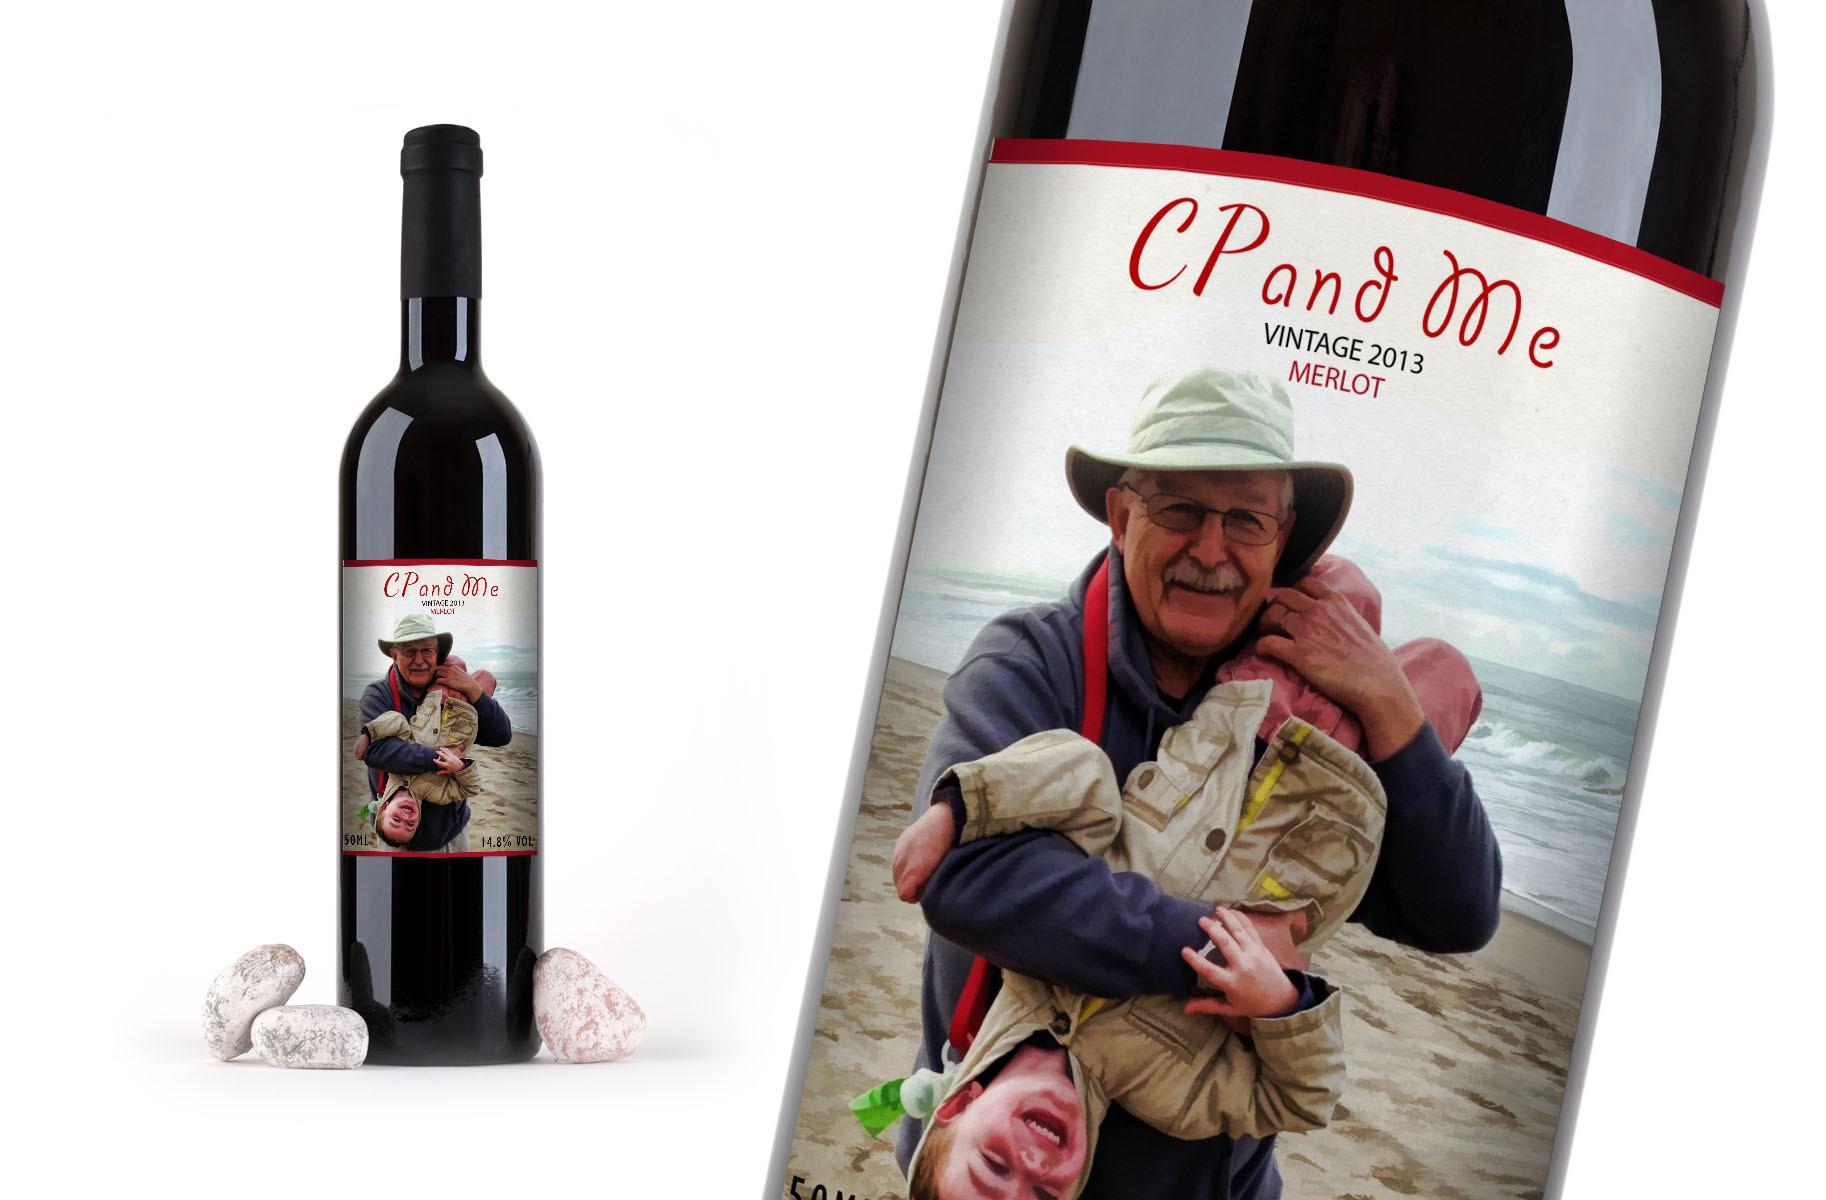 Creative Wine Bottle Label